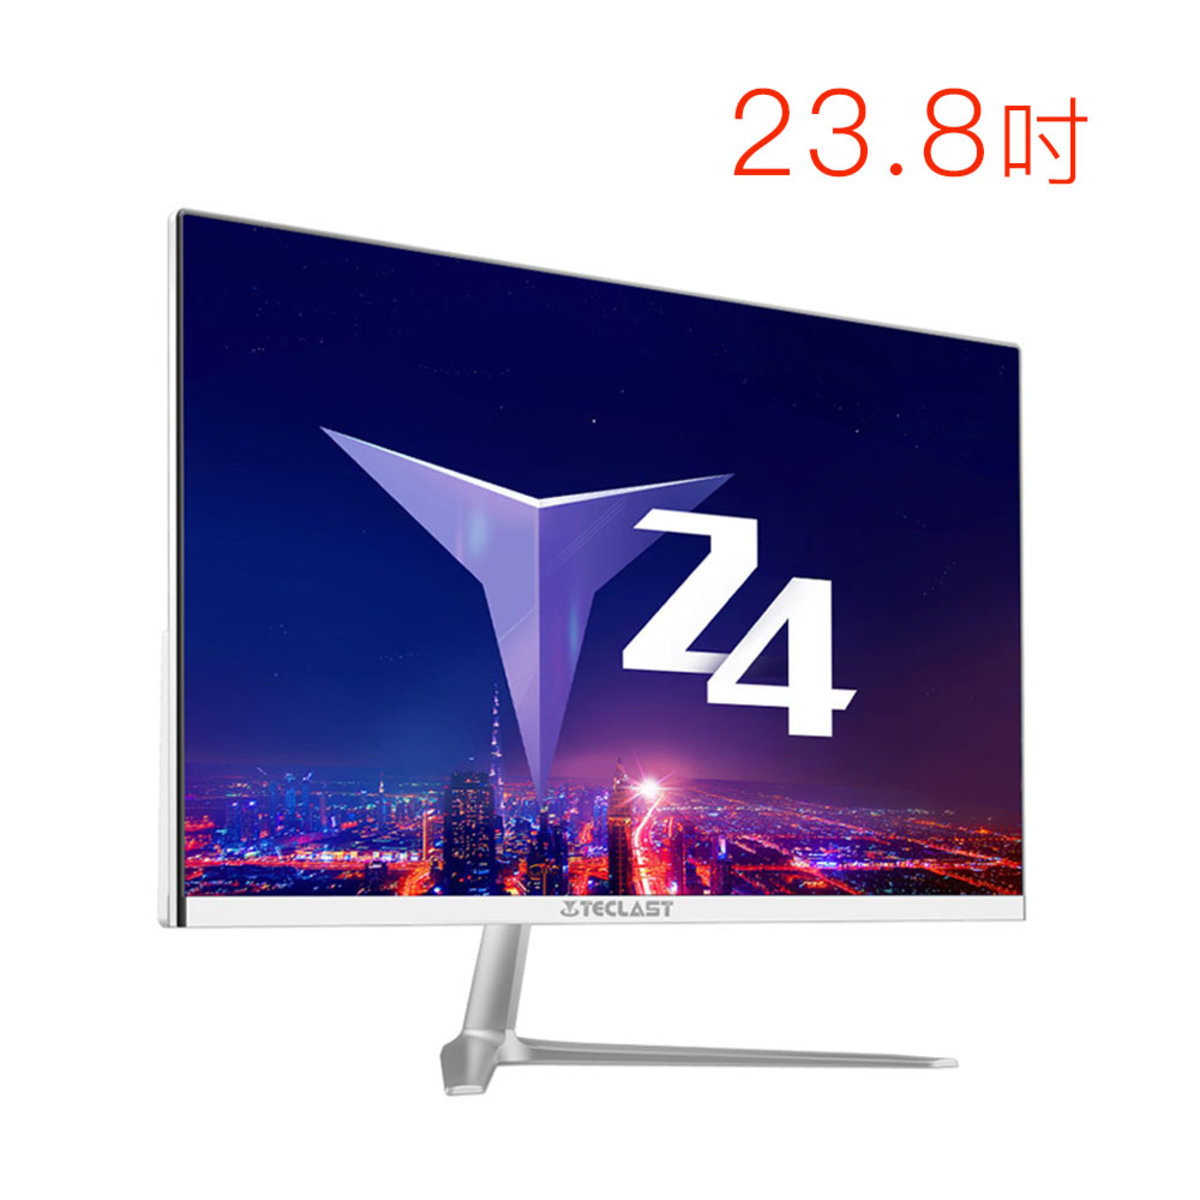 23.8吋無邊框一體式電腦 - T24 Air